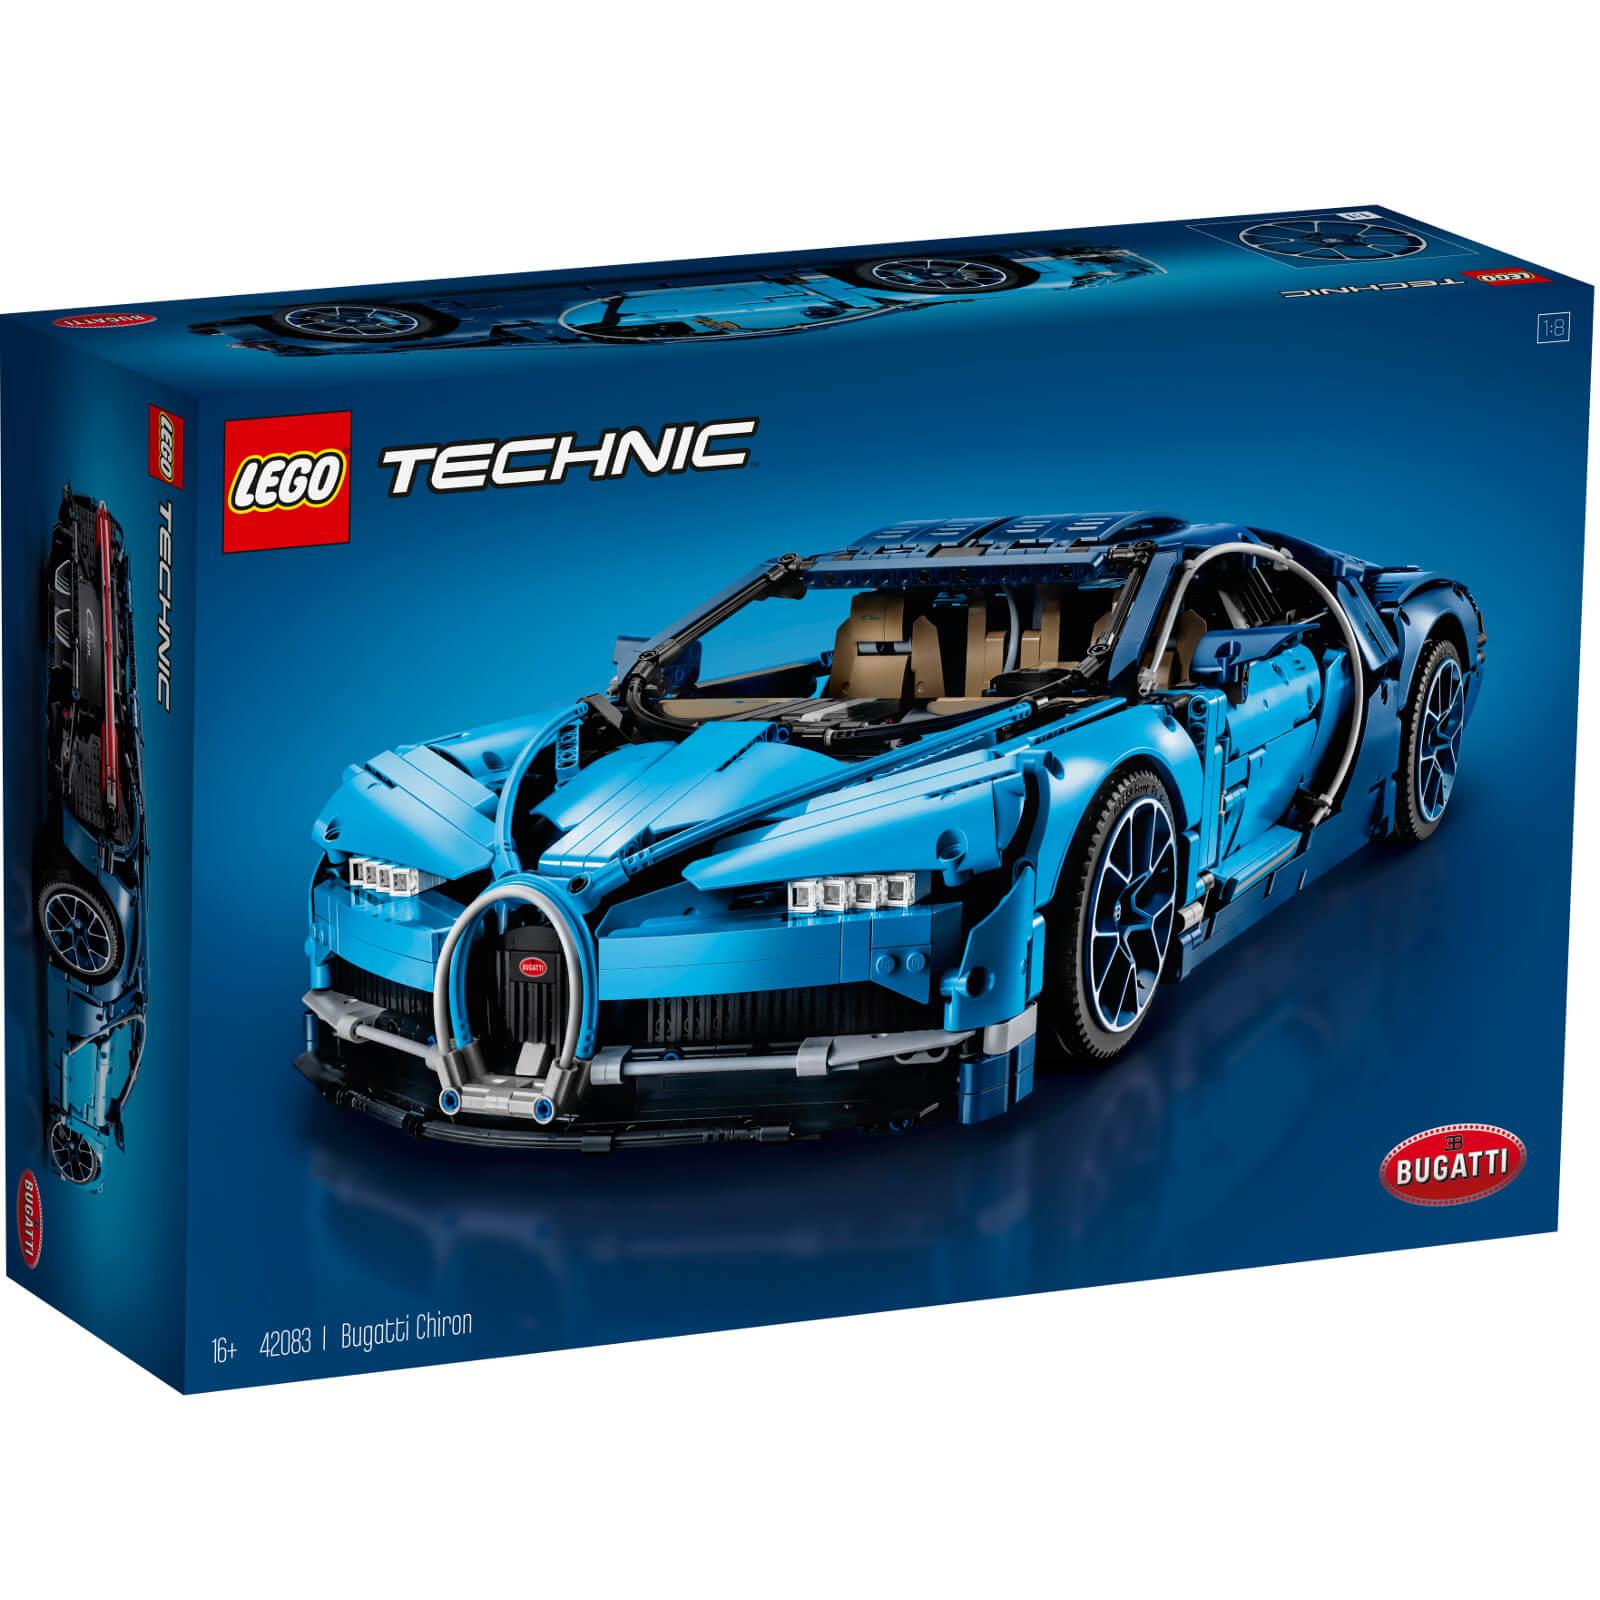 Lego Technic Bugatti Chiron 42083 Race Car Building Kit (3599-Pieces)